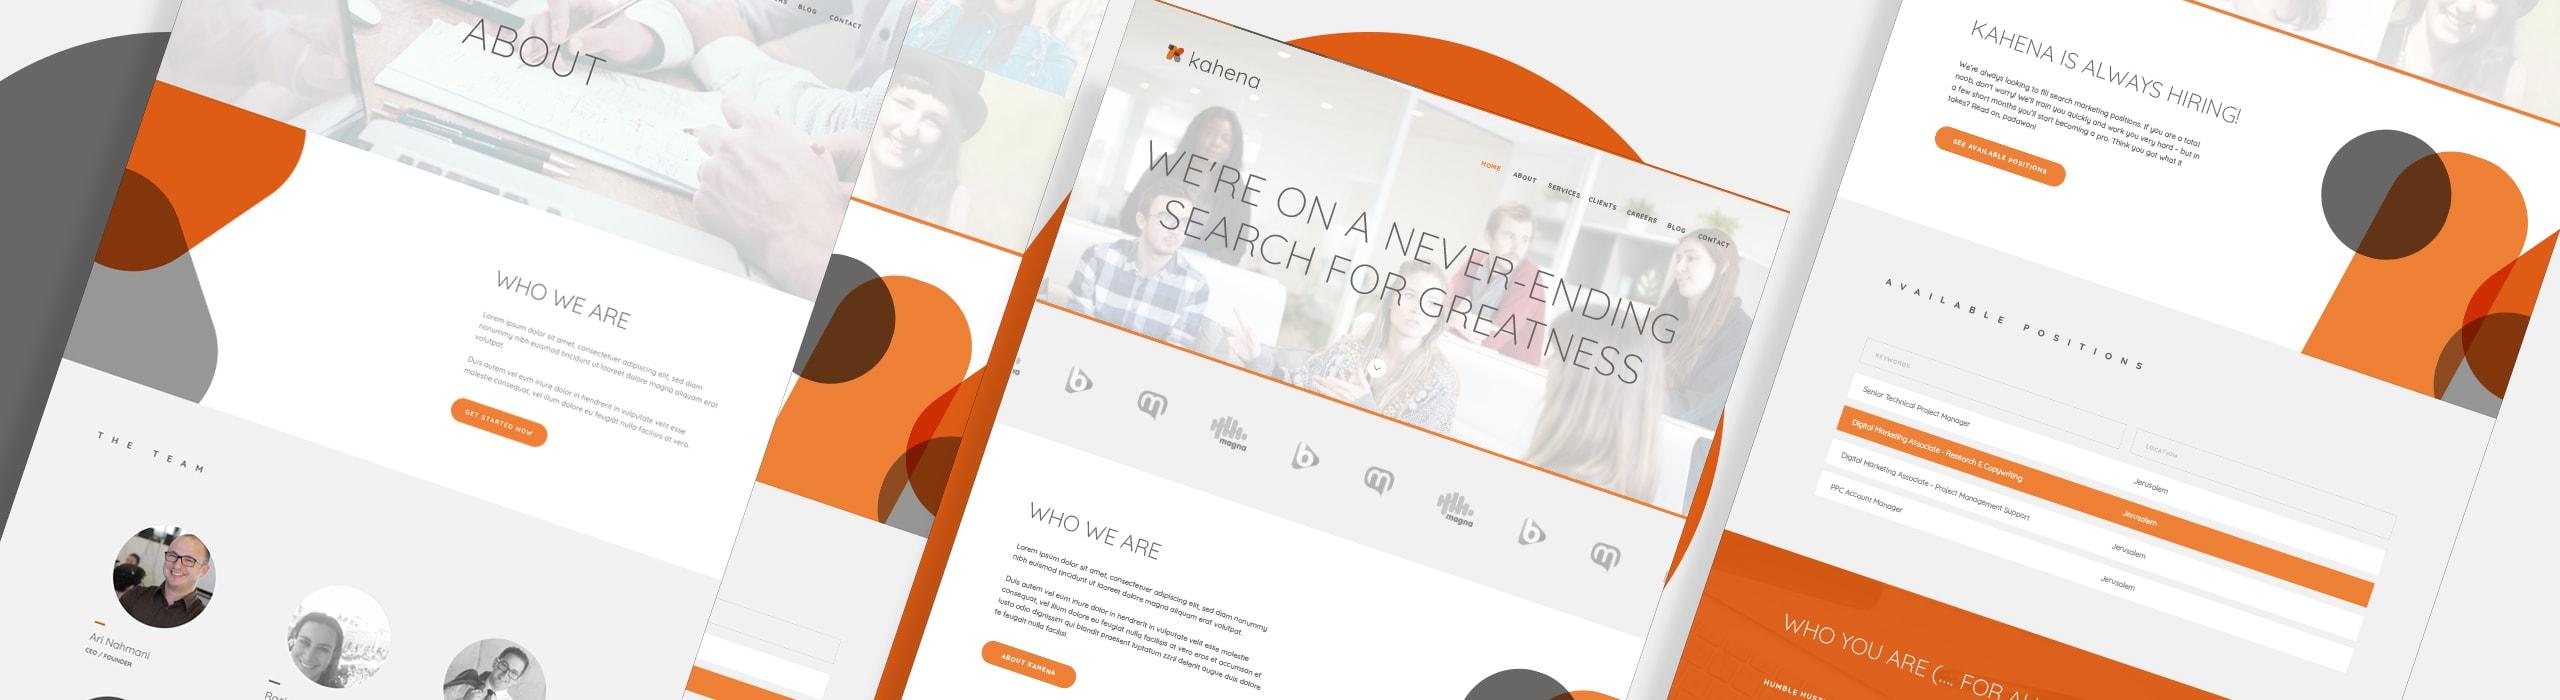 Kahena - 1 - Natie Branding Agency